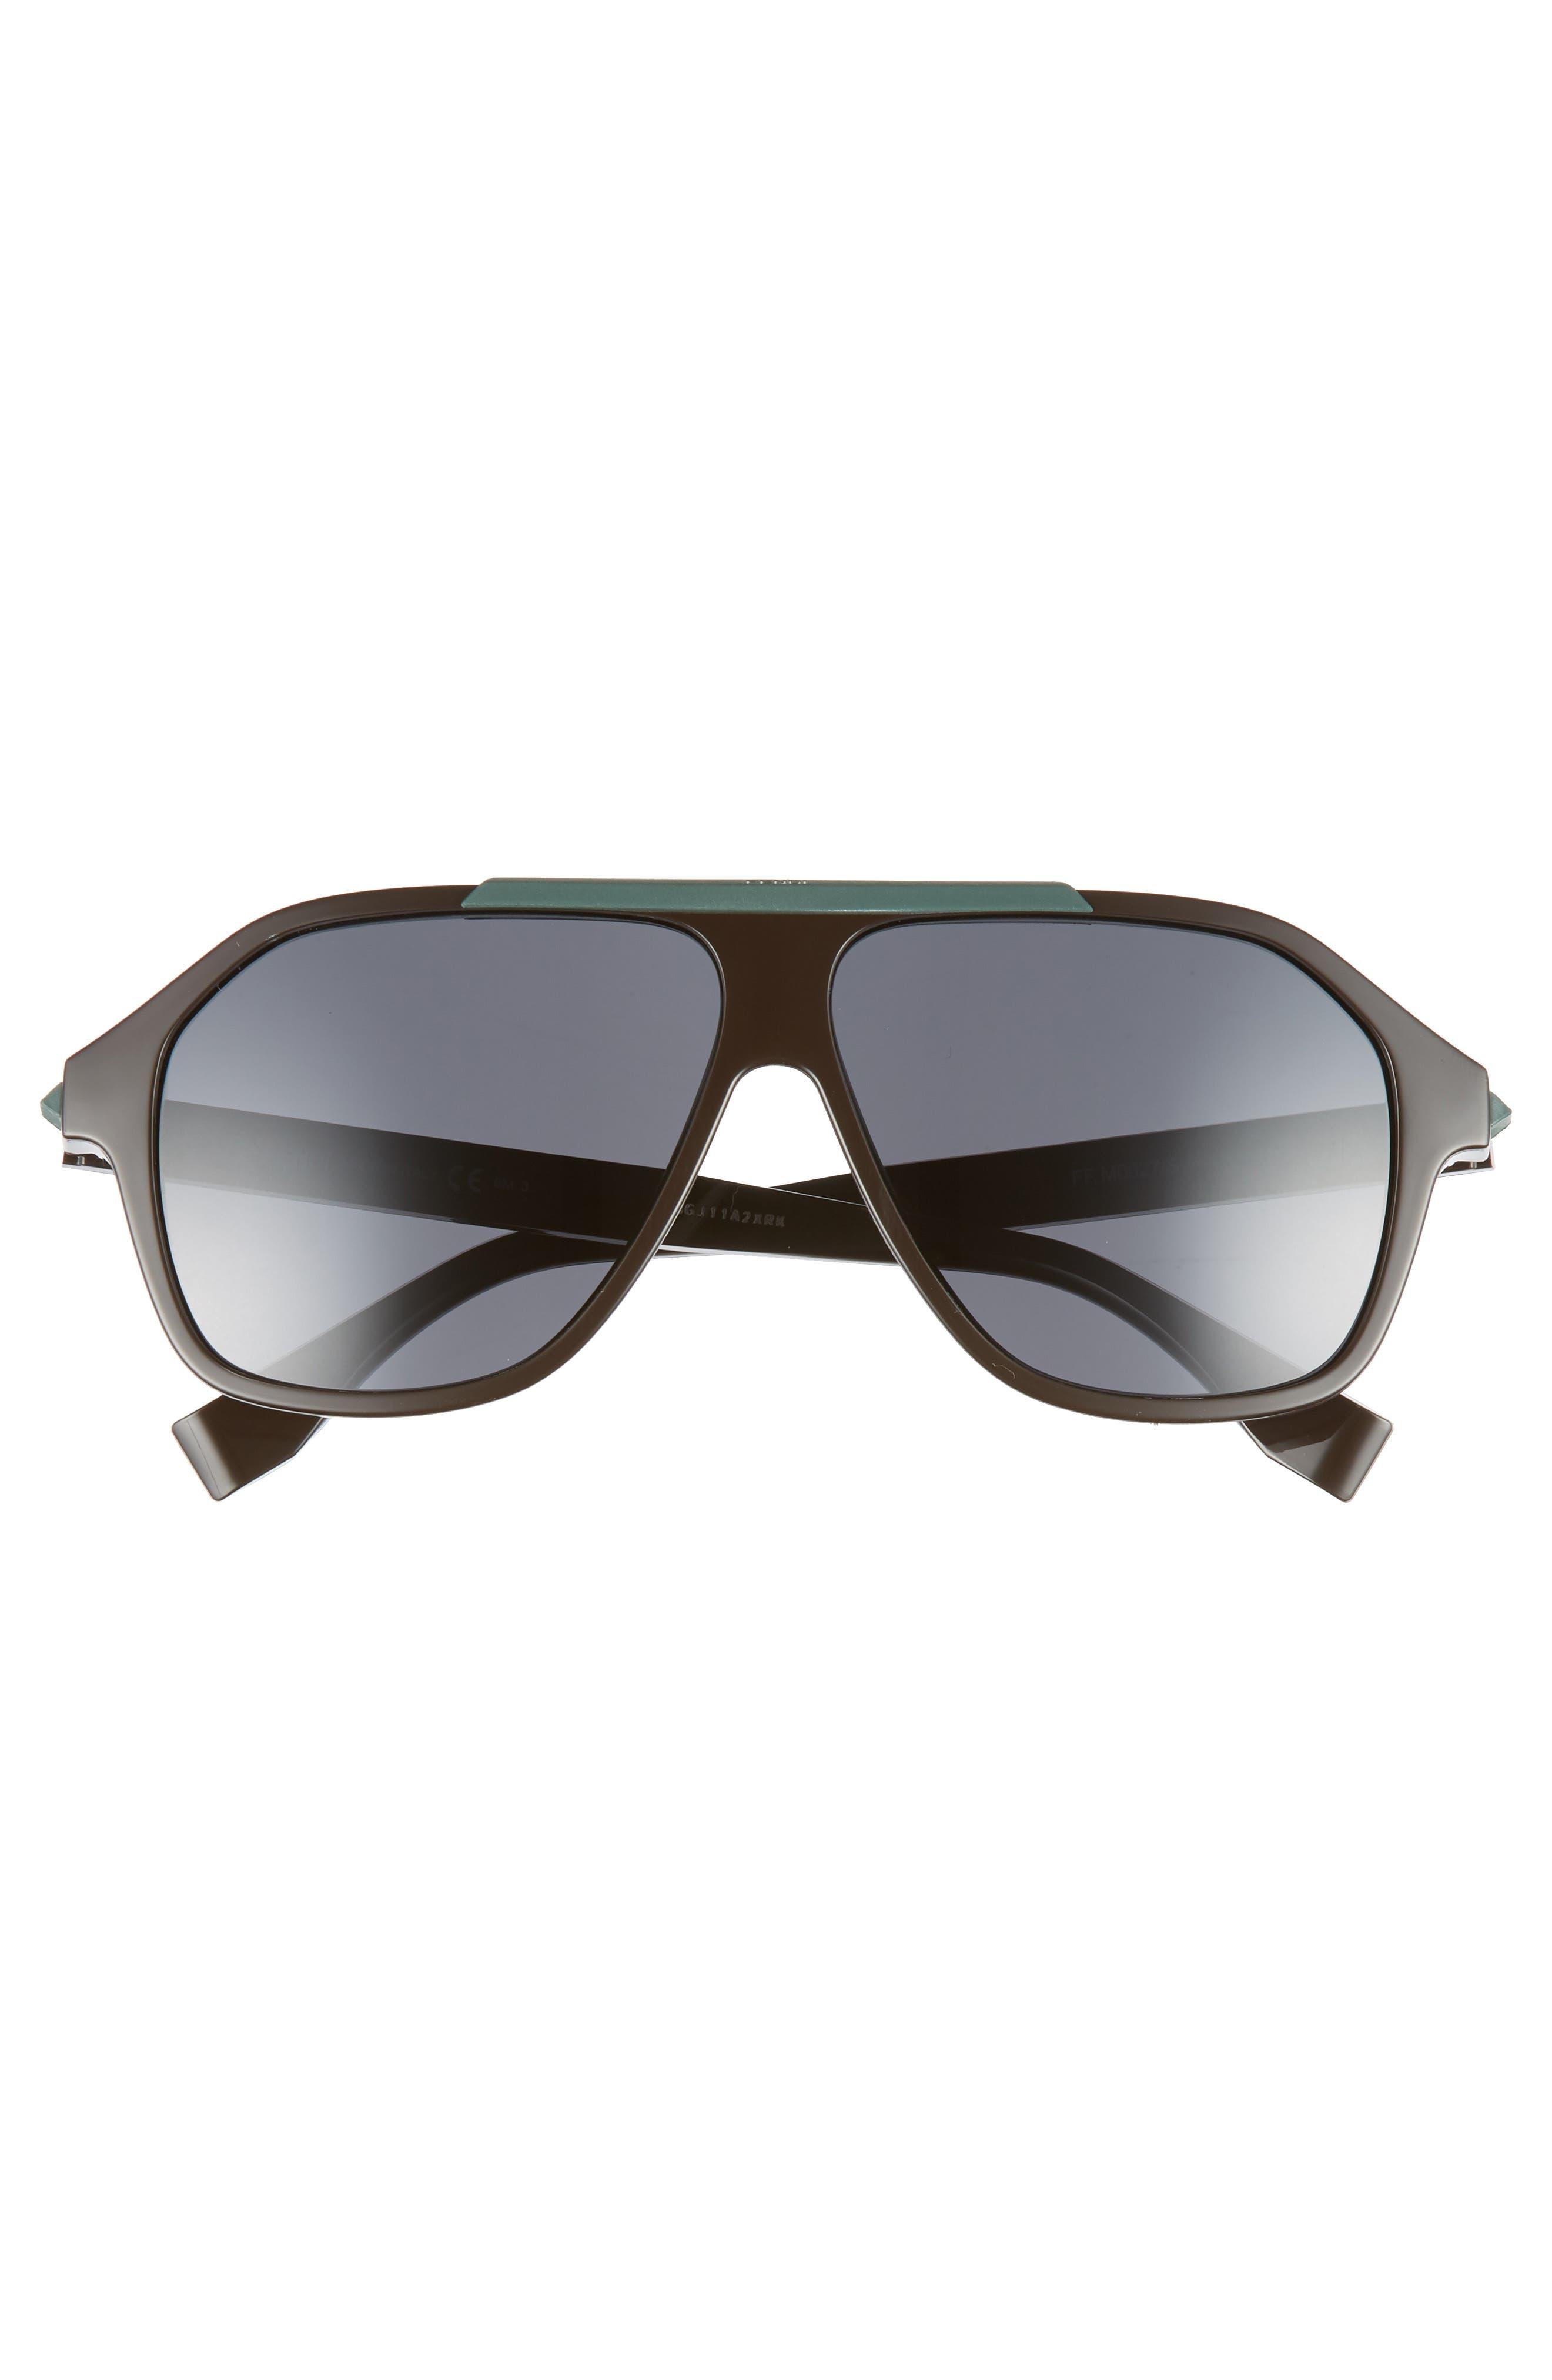 59mm Navigator Sunglasses,                             Alternate thumbnail 2, color,                             BROWN